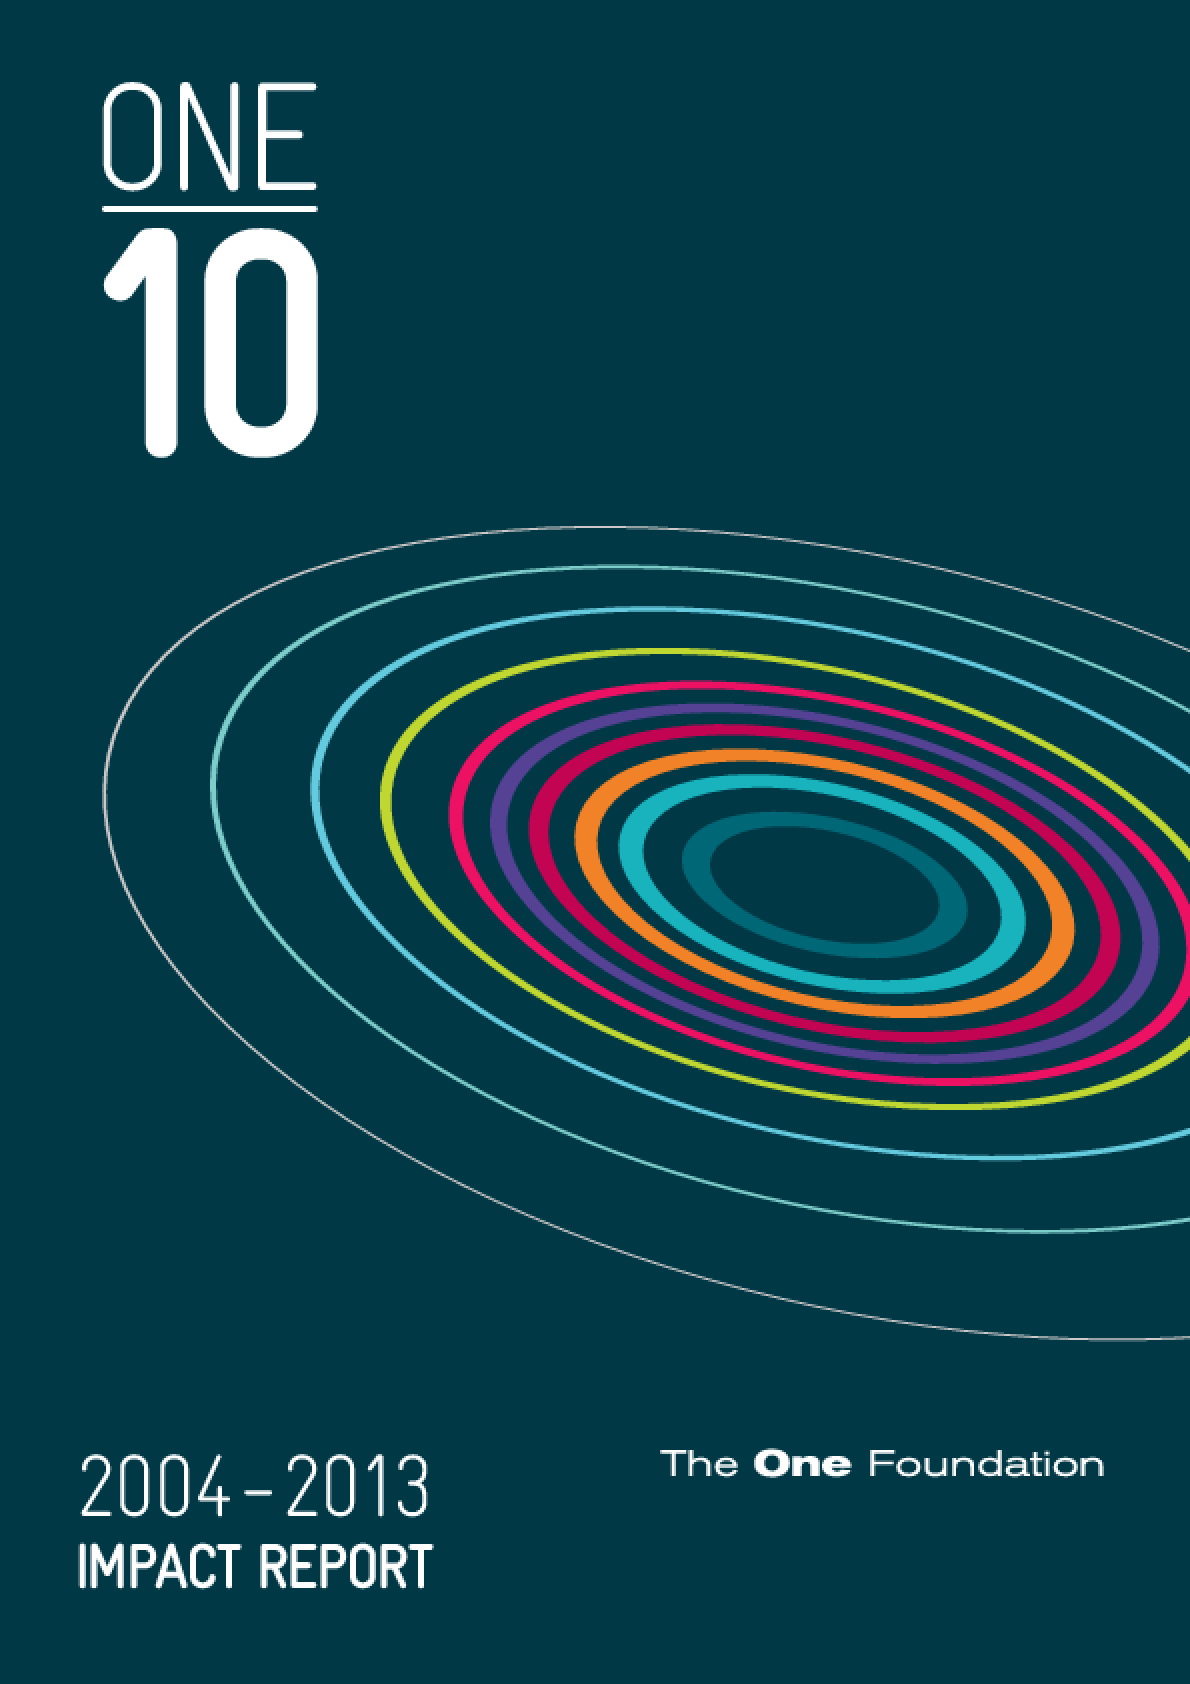 2004-2013 Impact Report